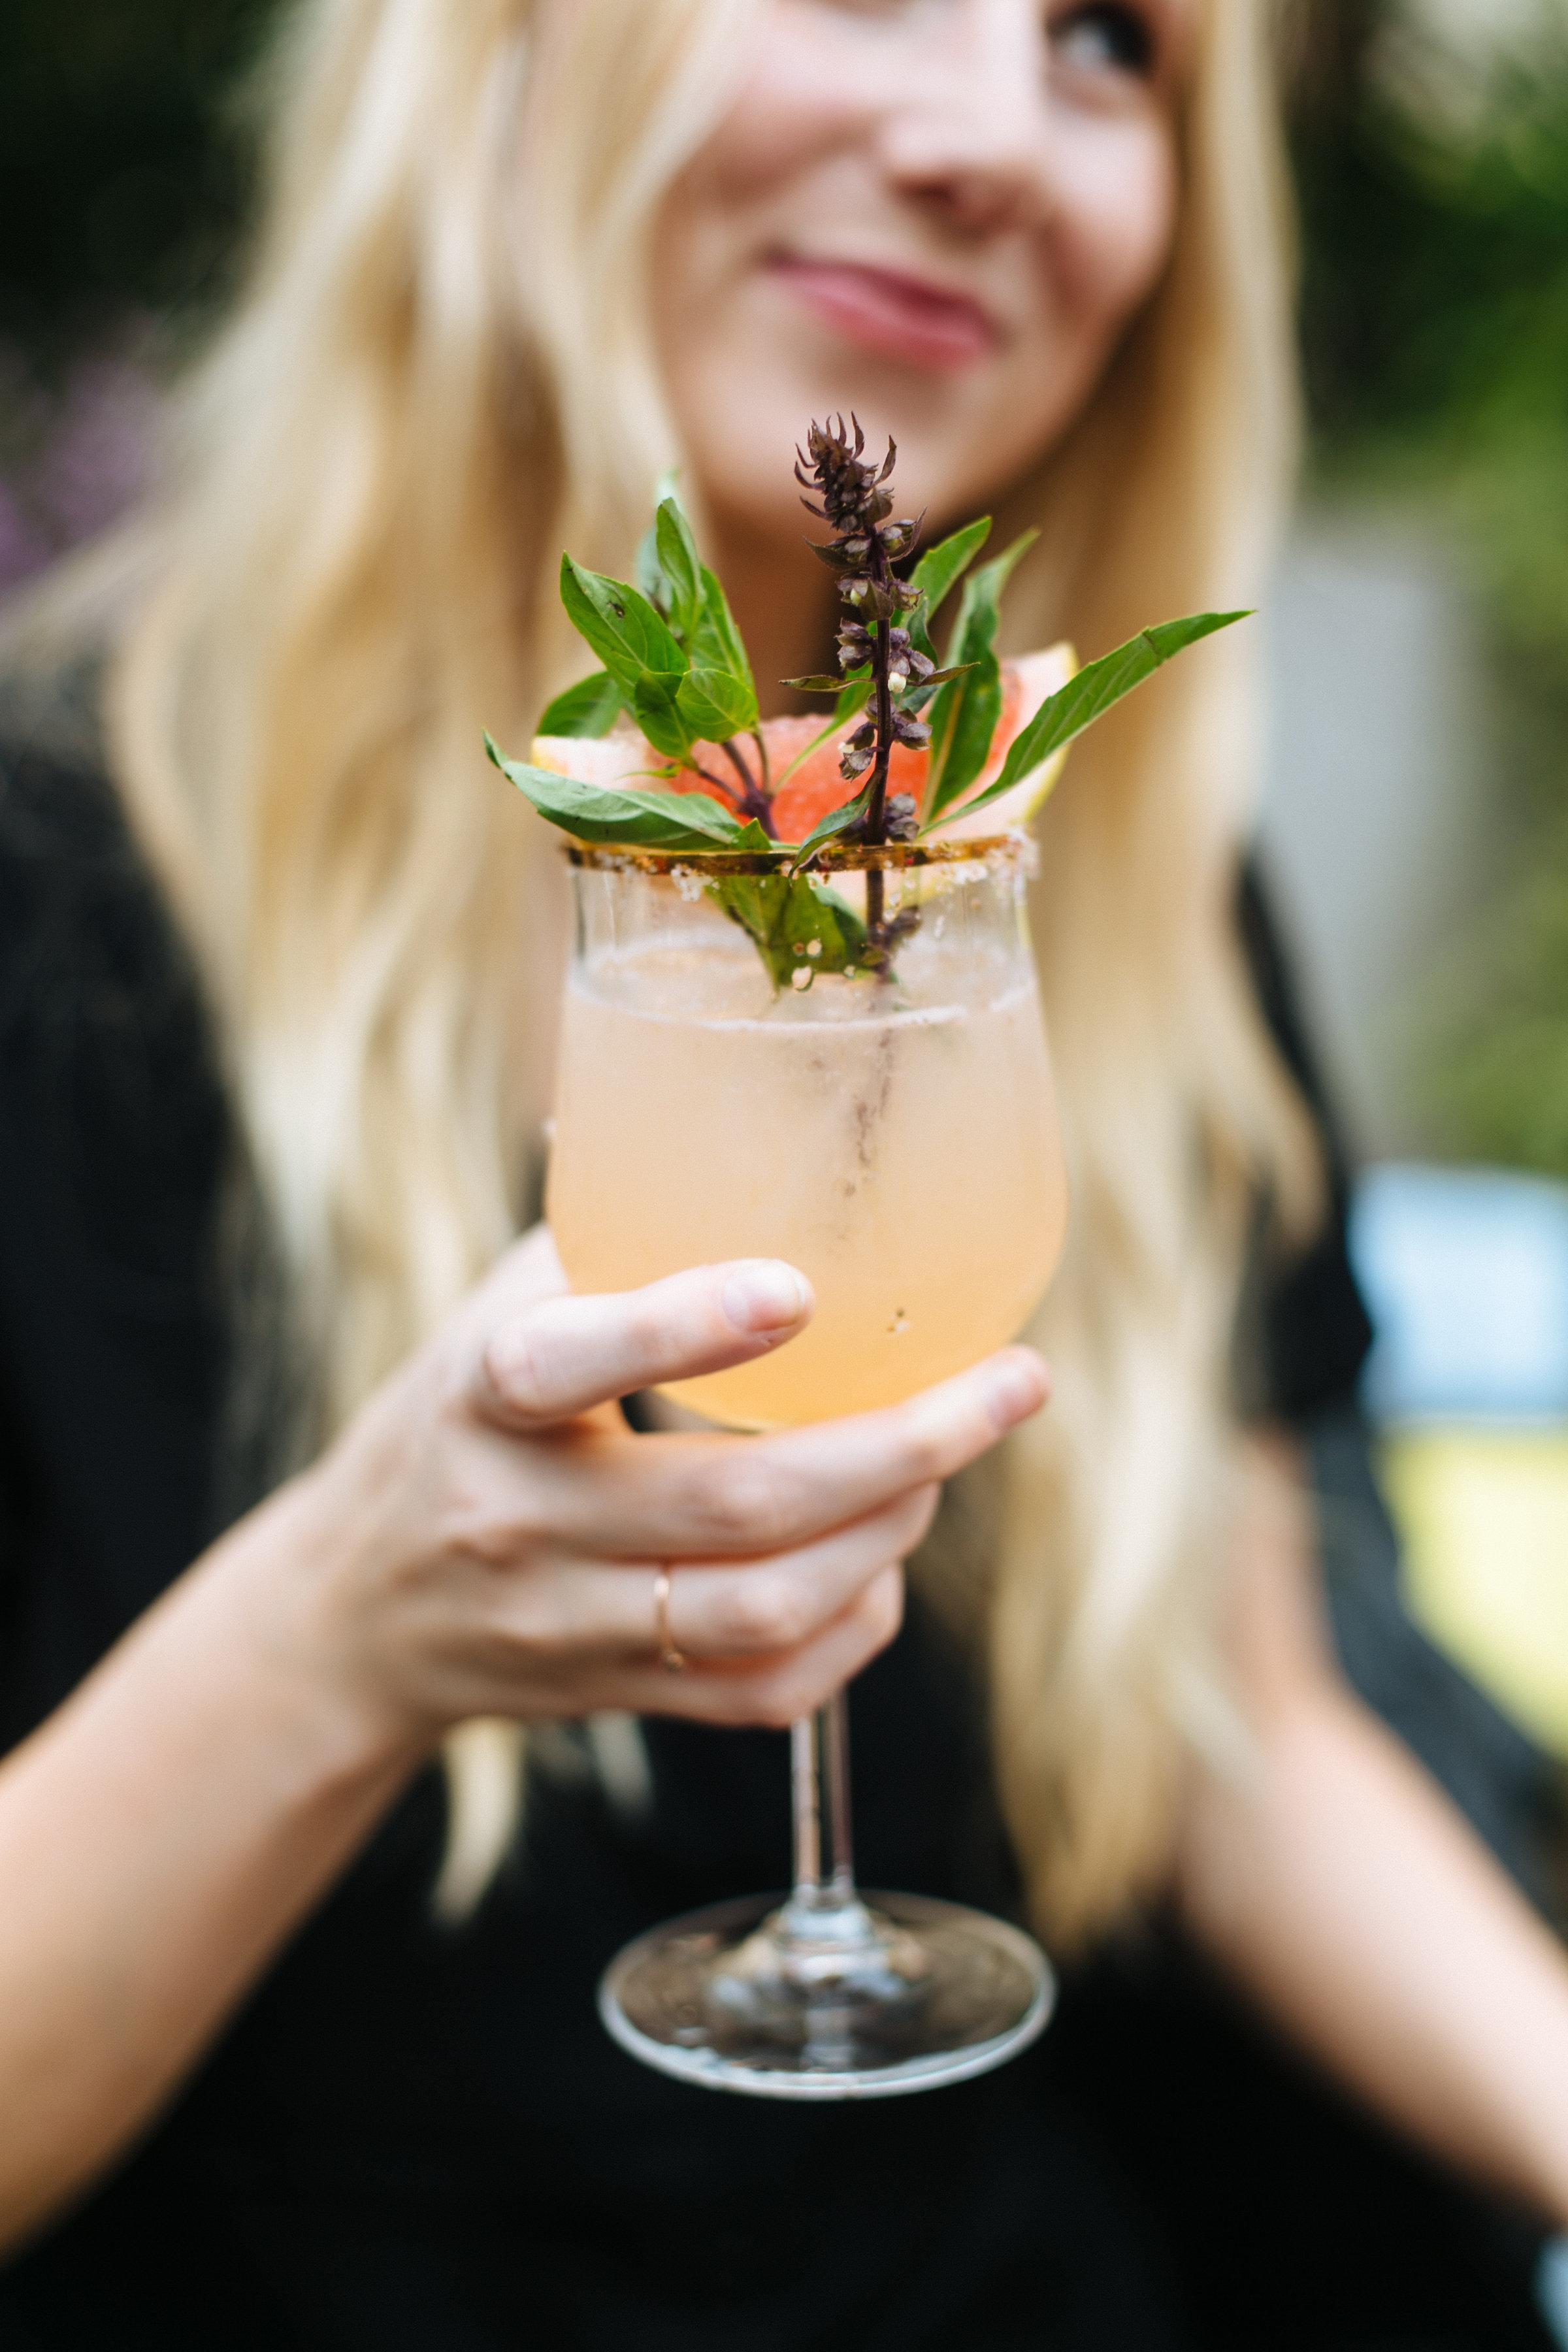 Copy of Bri Emery holding a Altos tequila cocktail